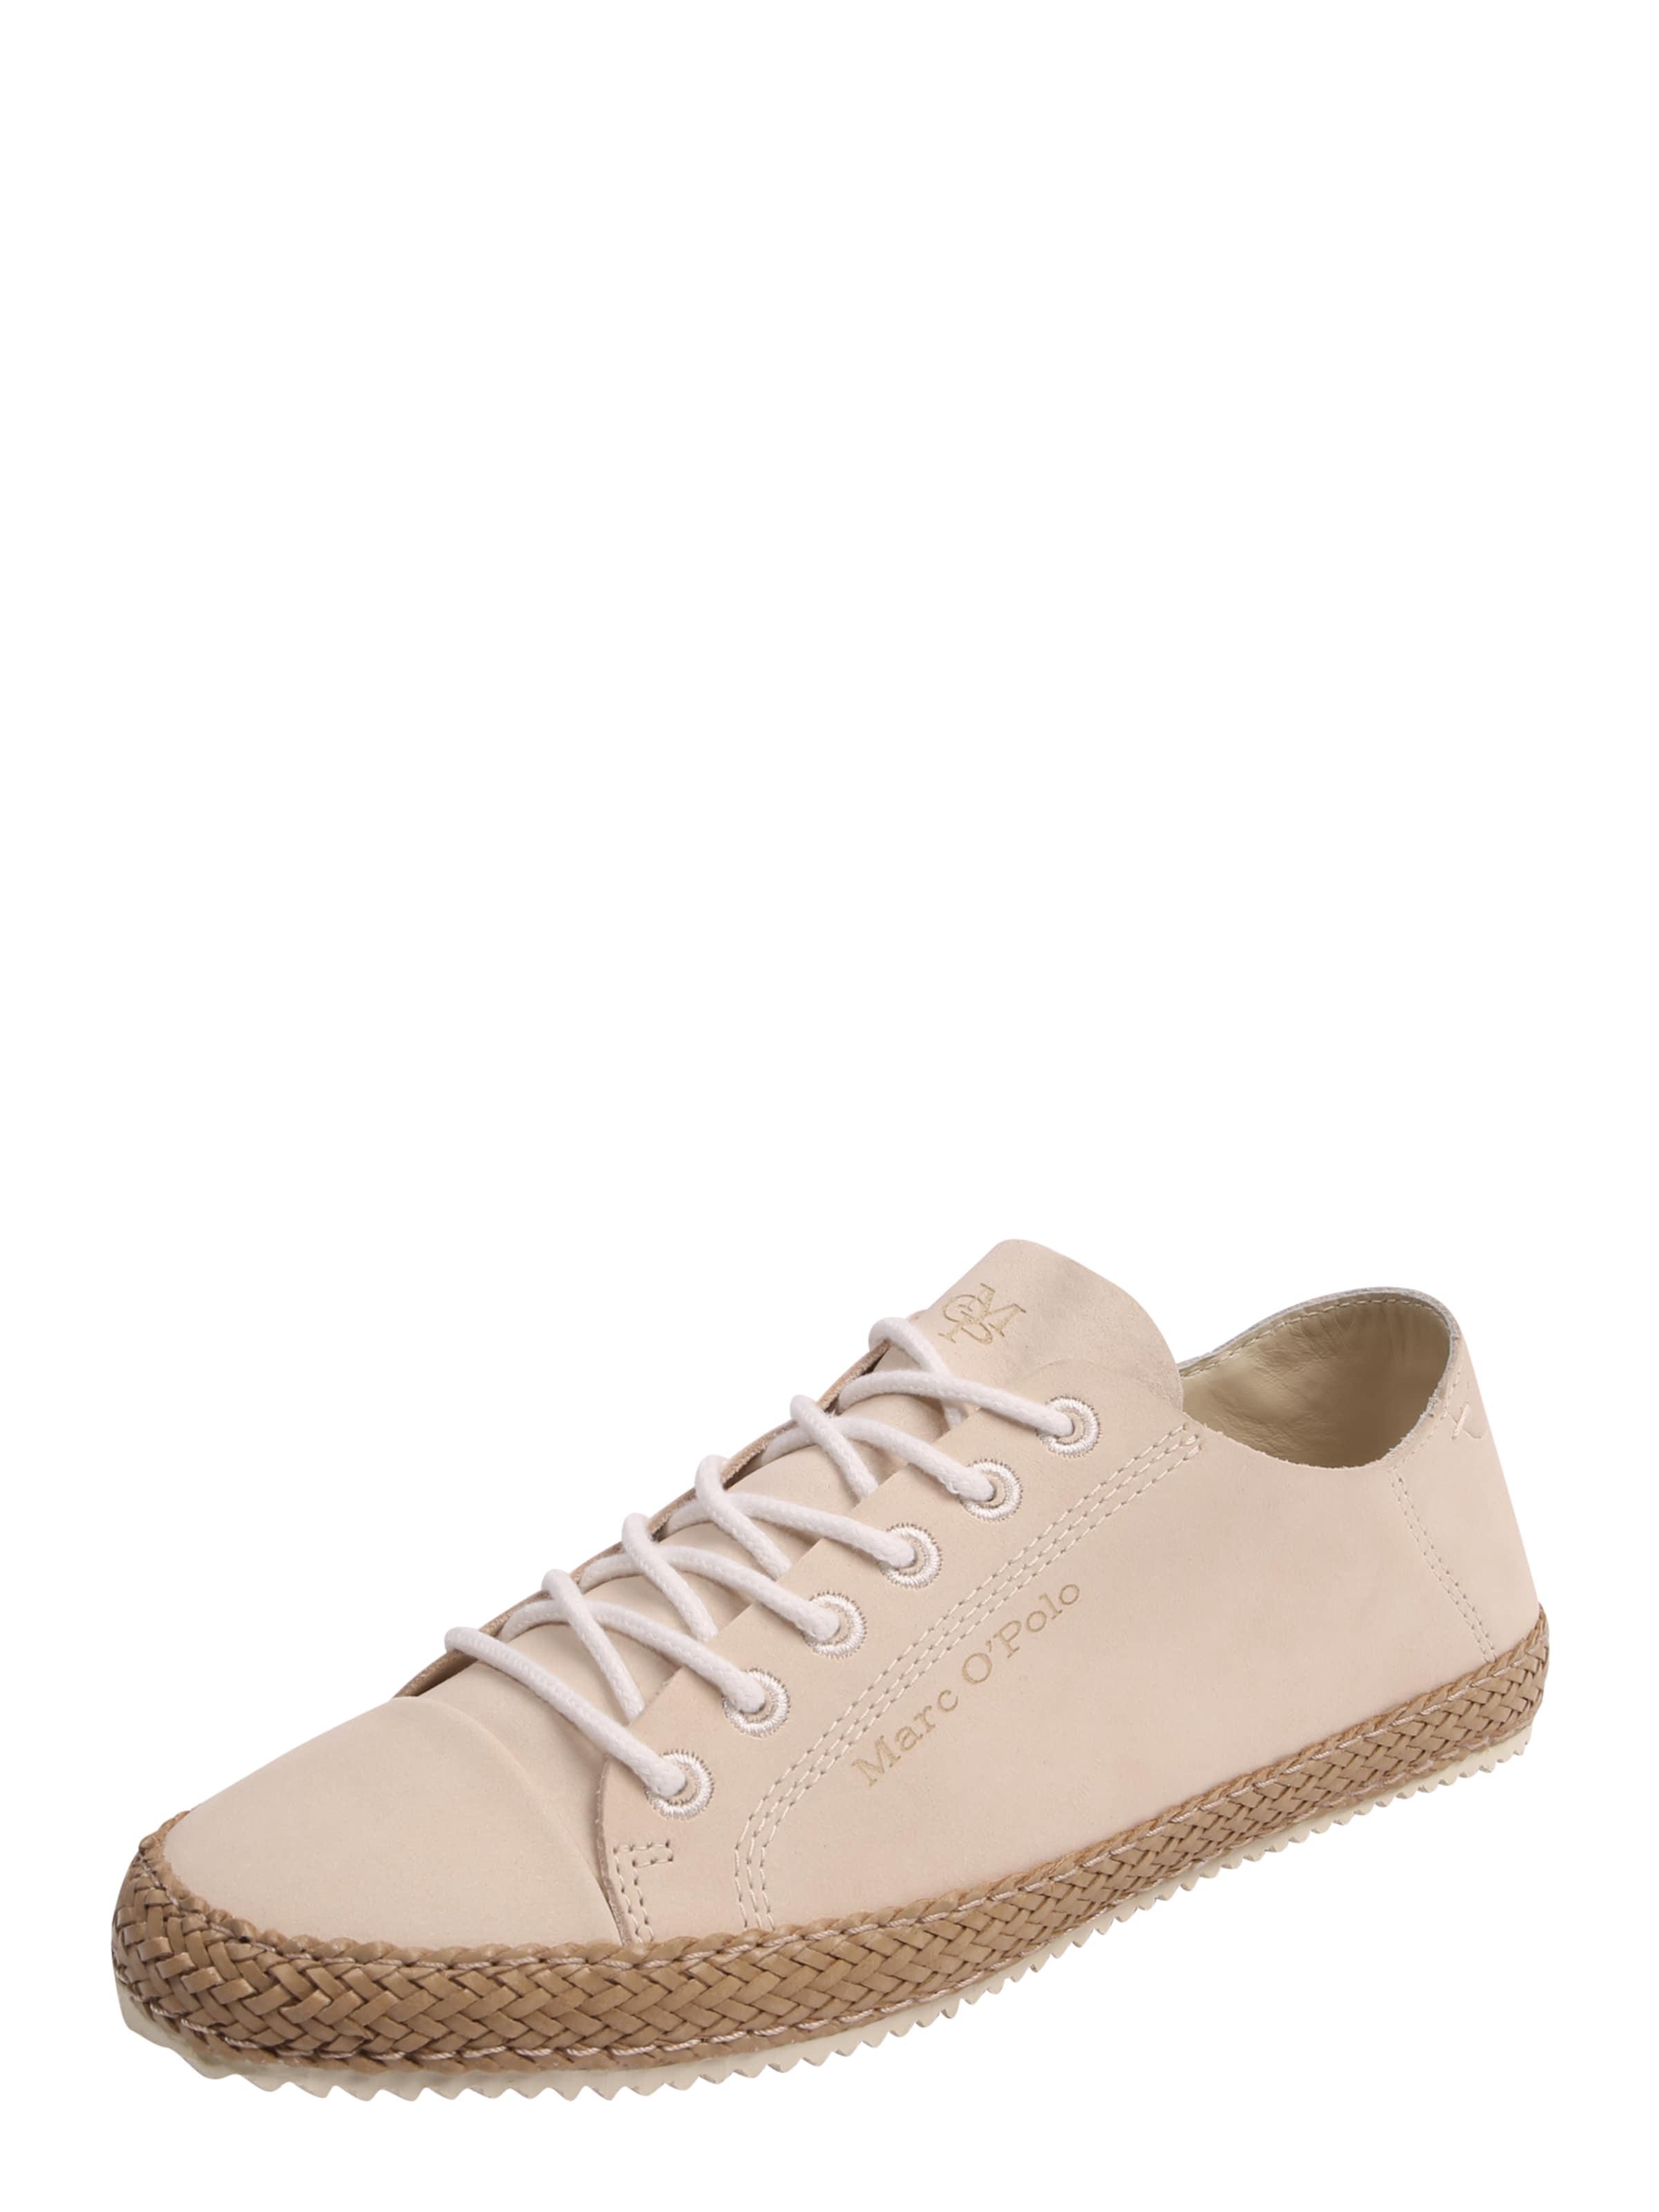 Marc Chaussures En Dentelle Crème O'polo « 100le » 0nGXIIMdE